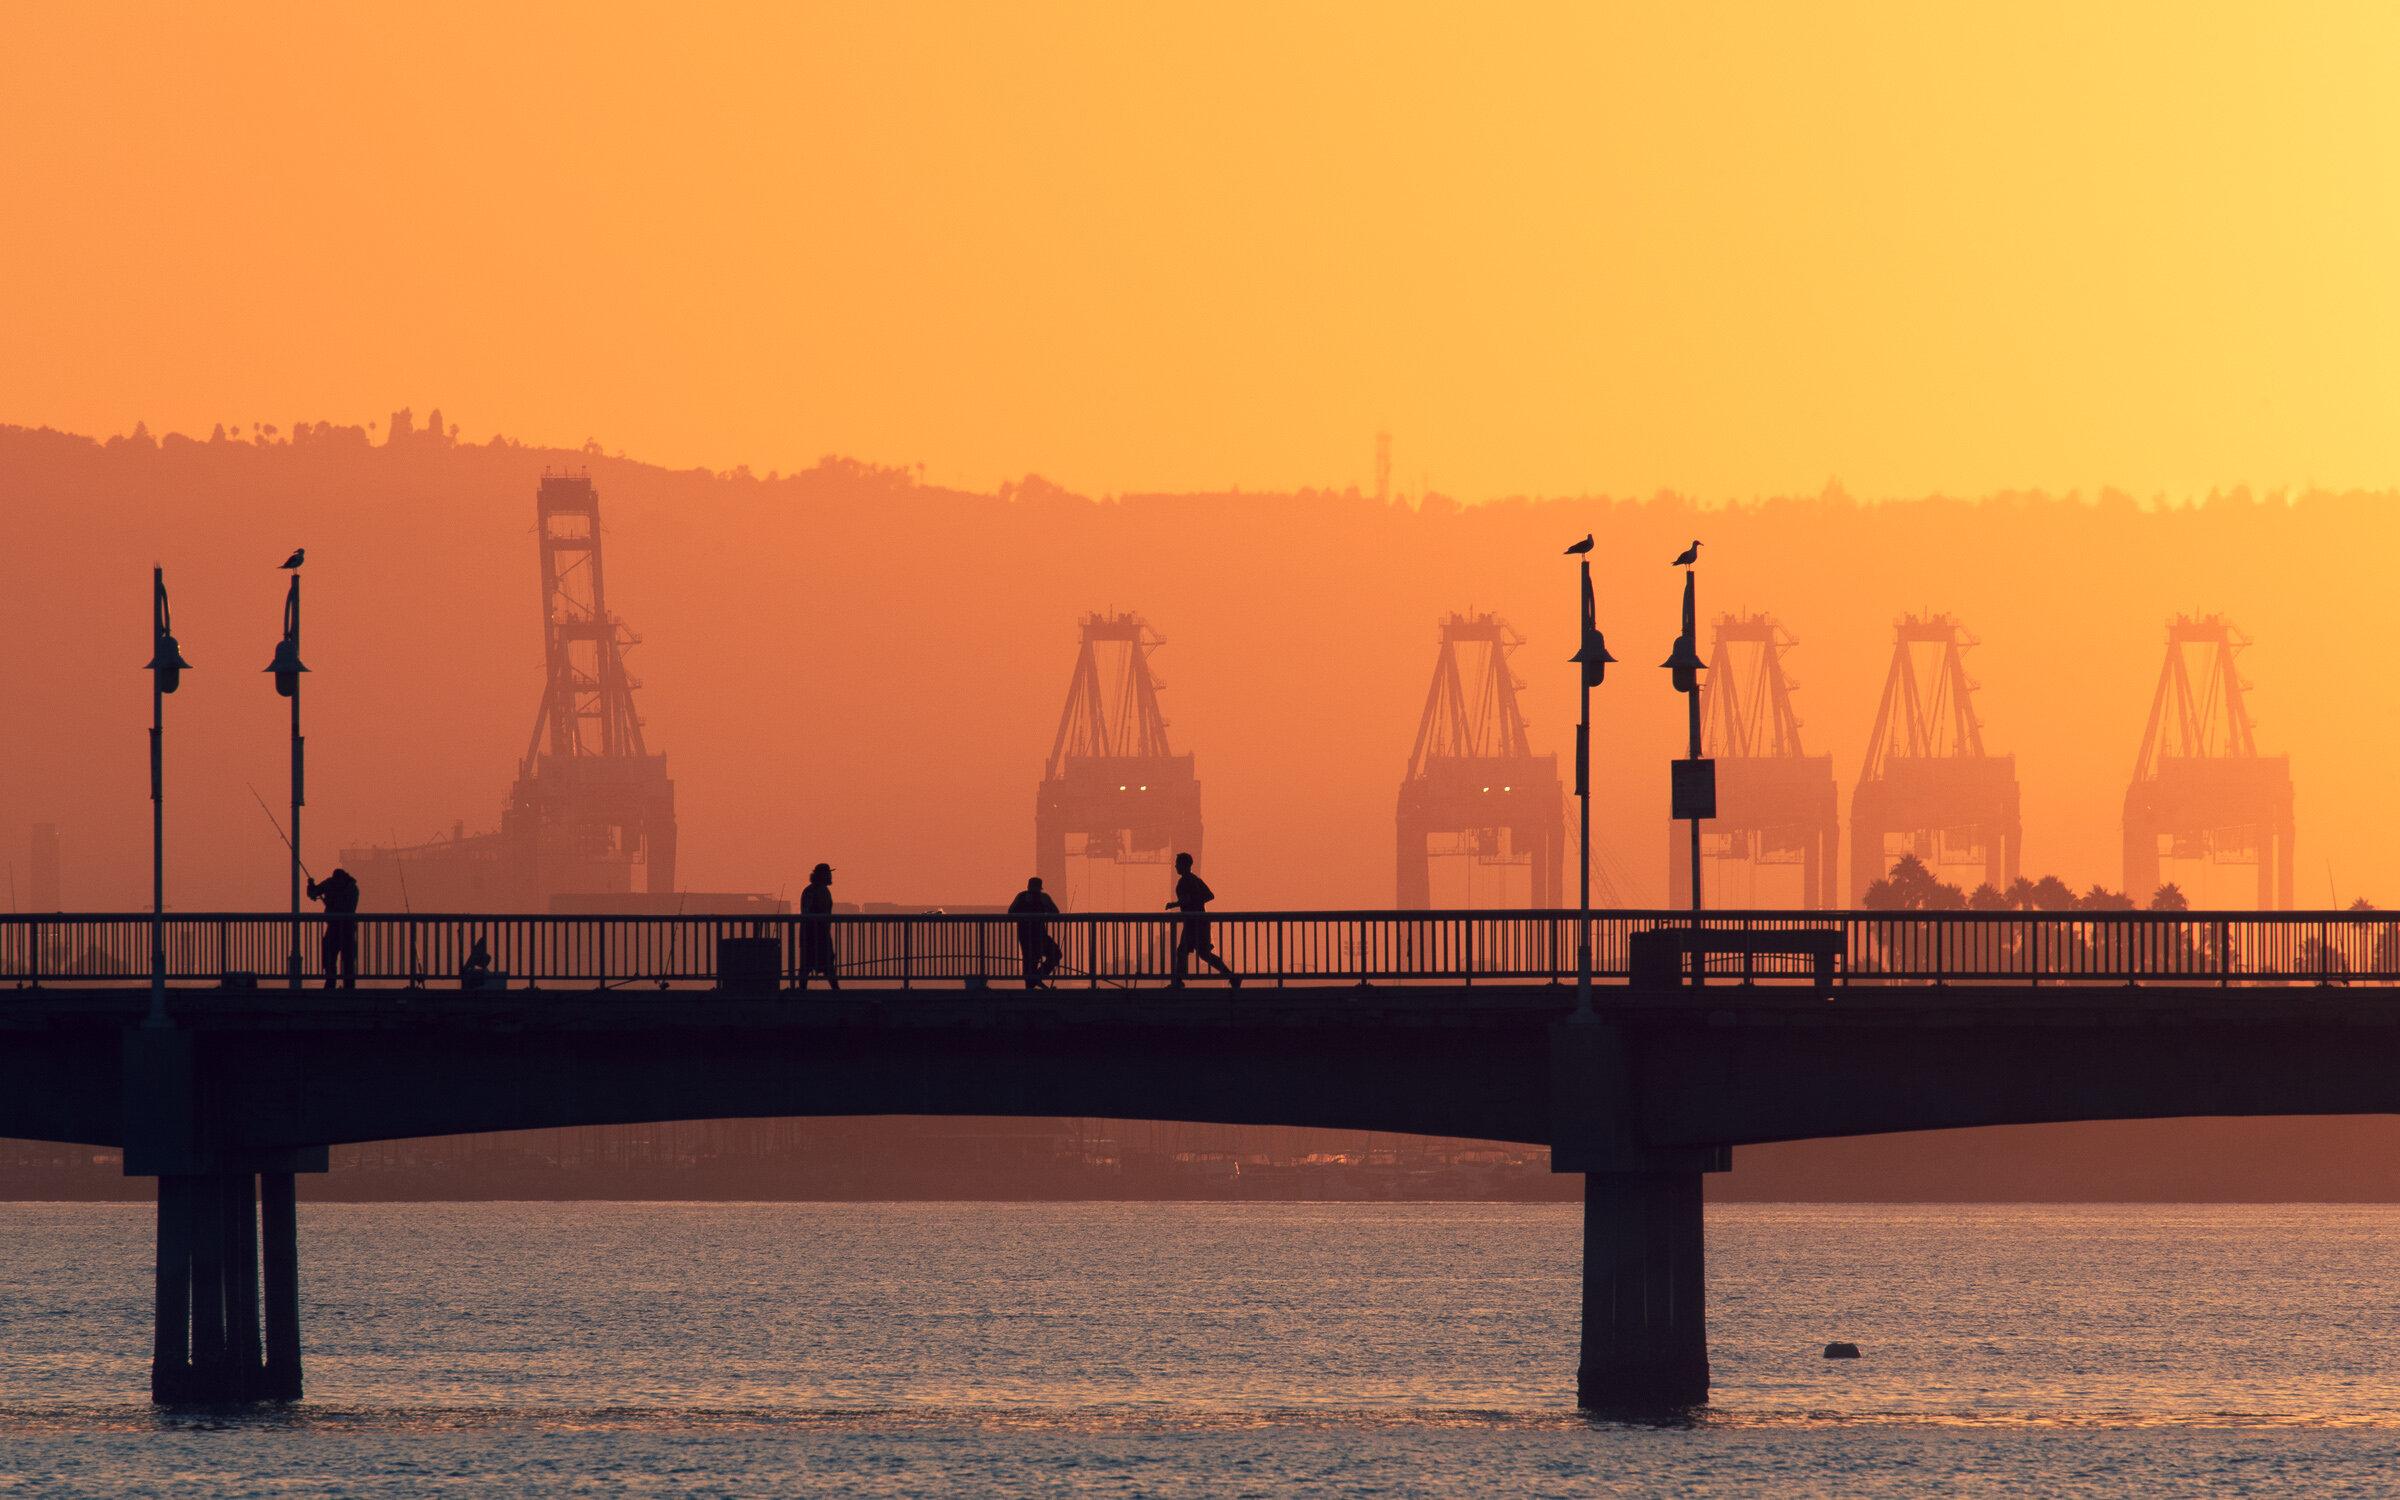 Jogger on Belmont Pier